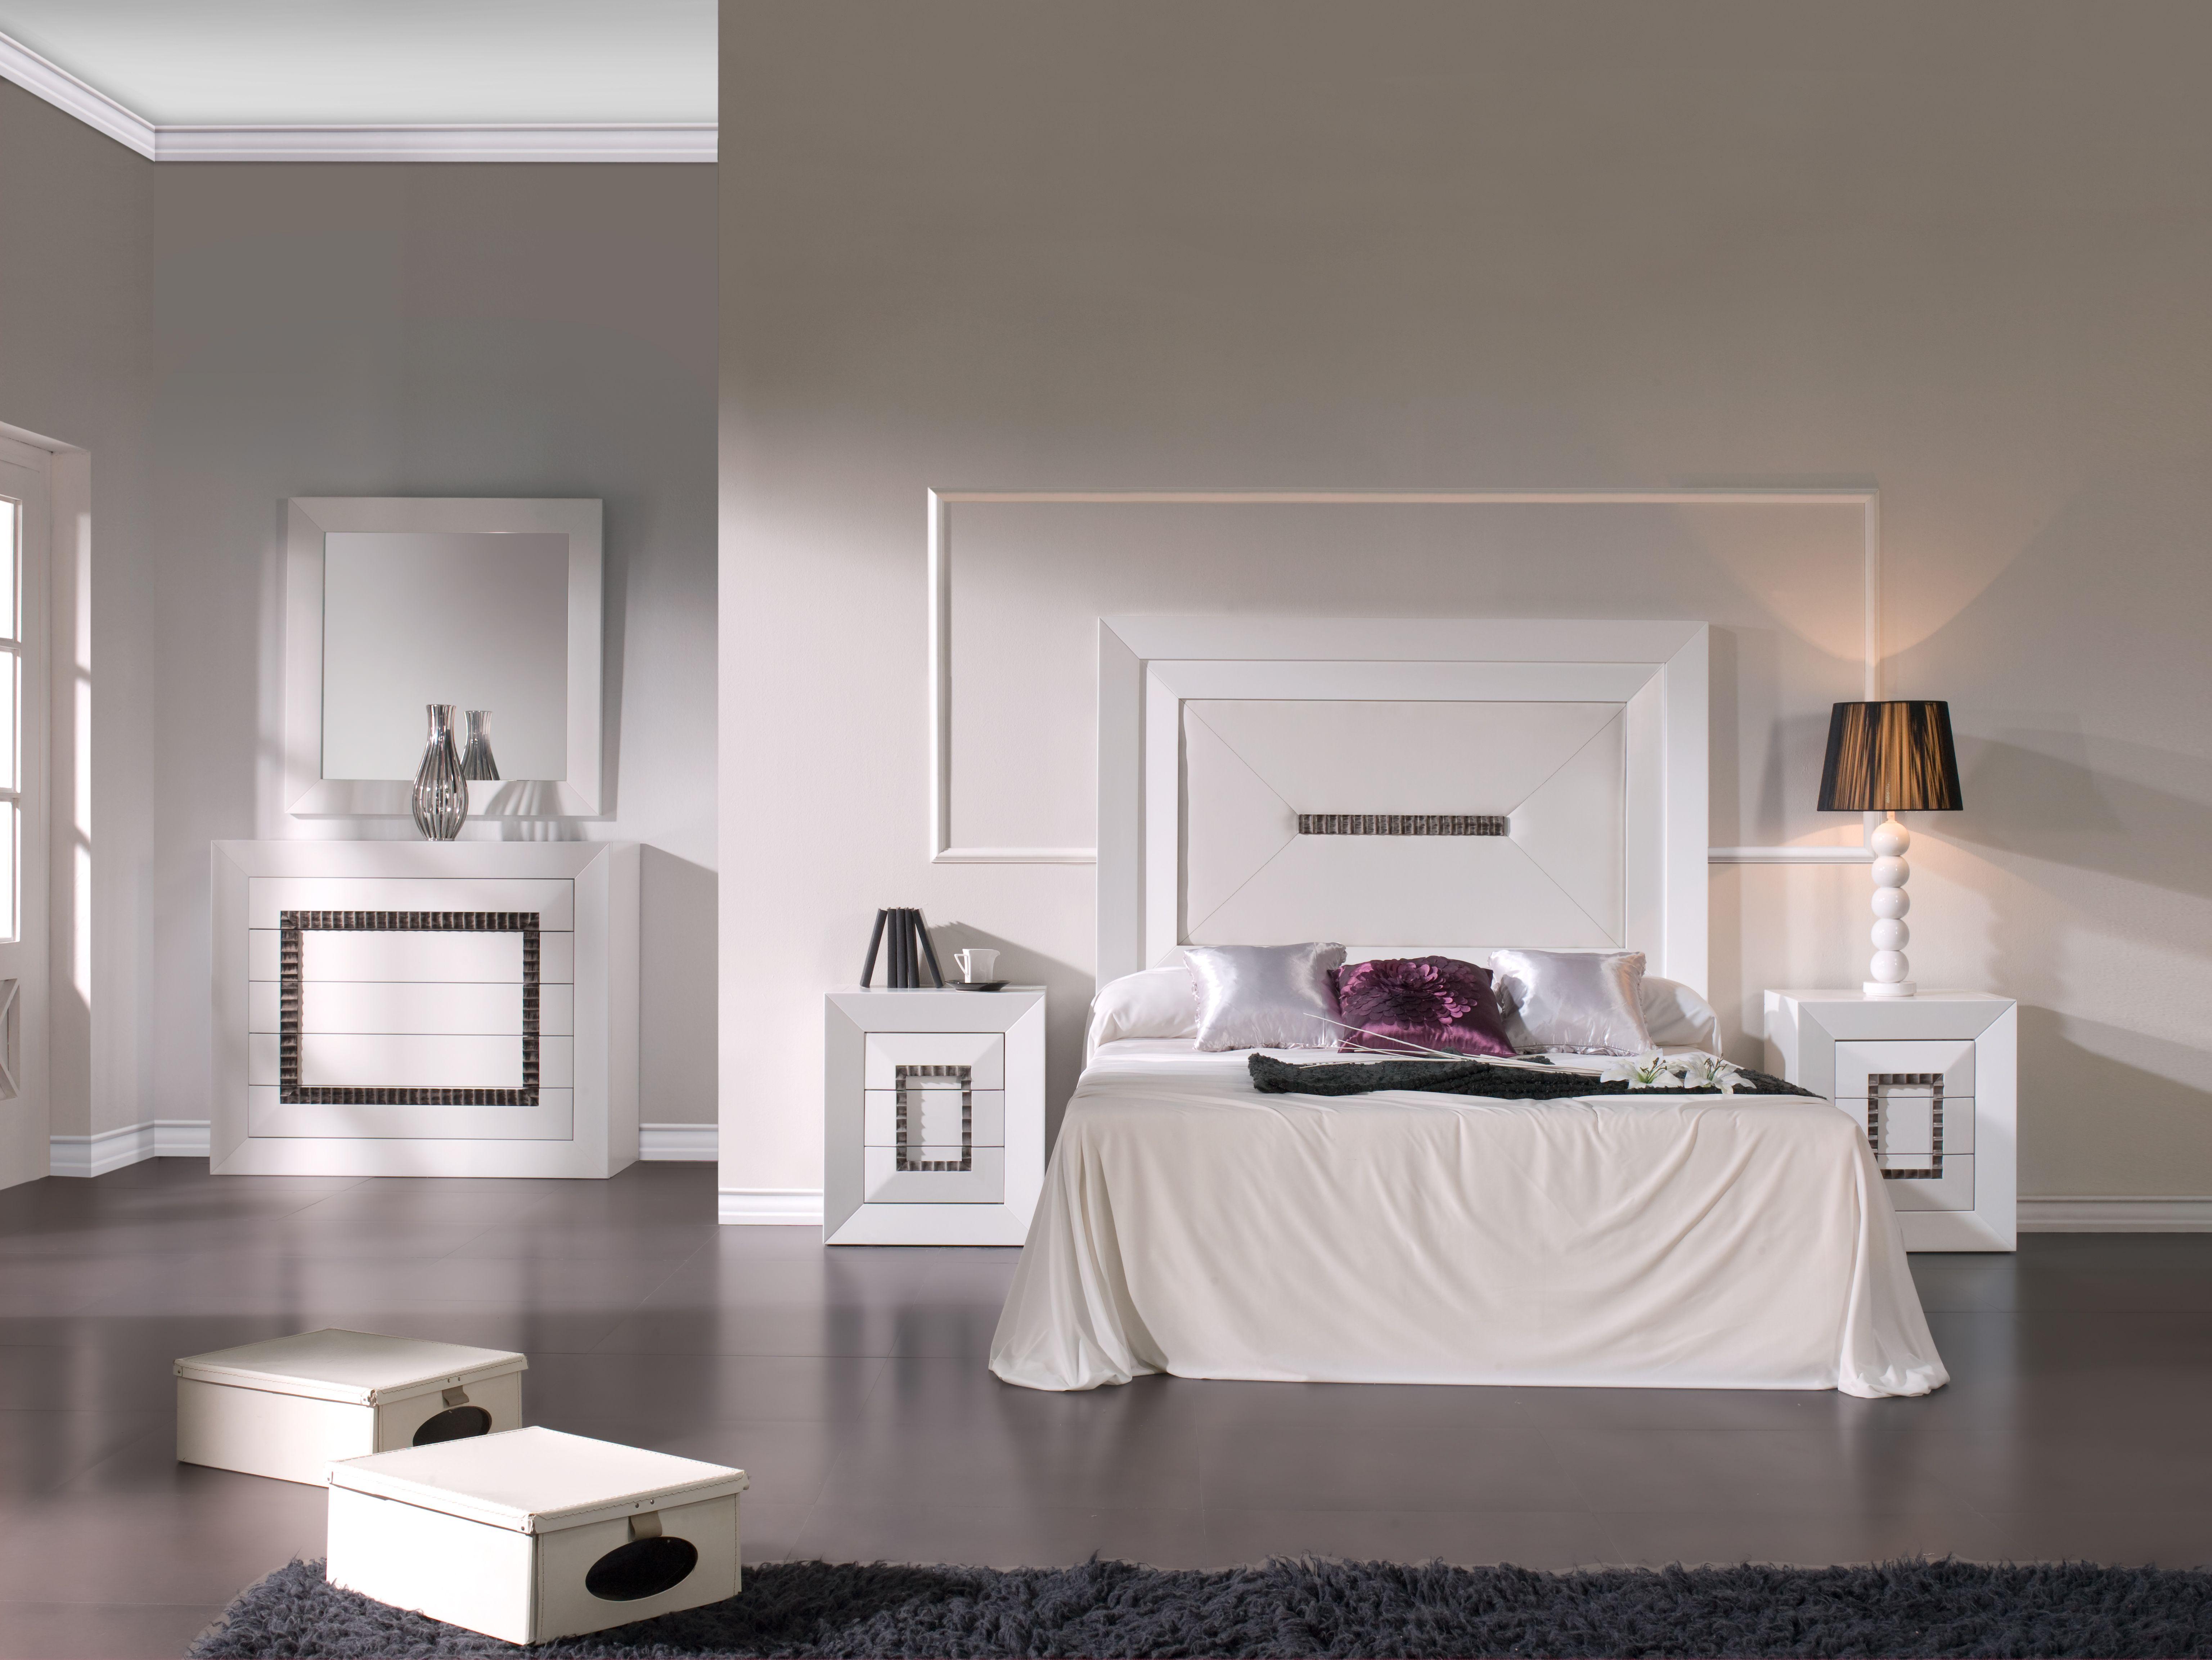 Dormitorio Matrimonio De L Neas Suaves Y Elegantes Home Sweet  # Muebles Compostela Oportunidades